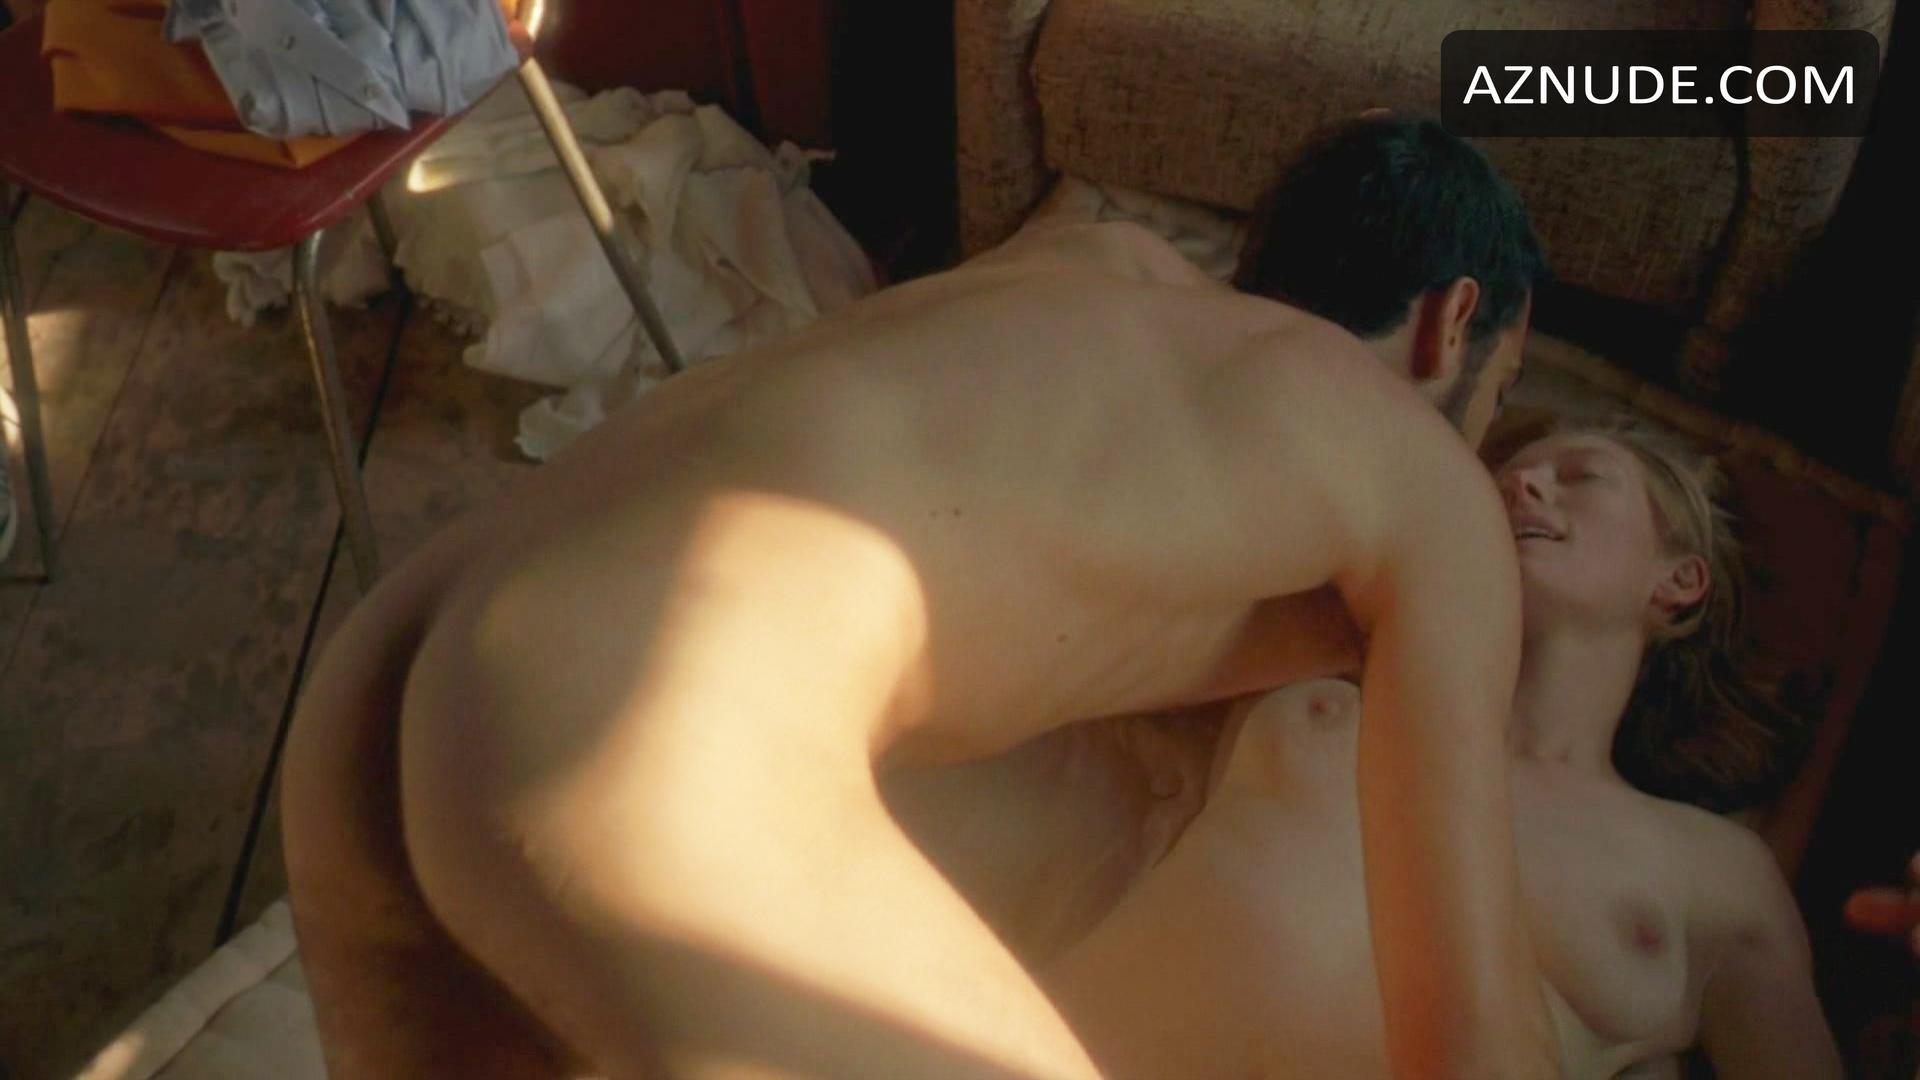 Terminator love scene girl nude apologise, that